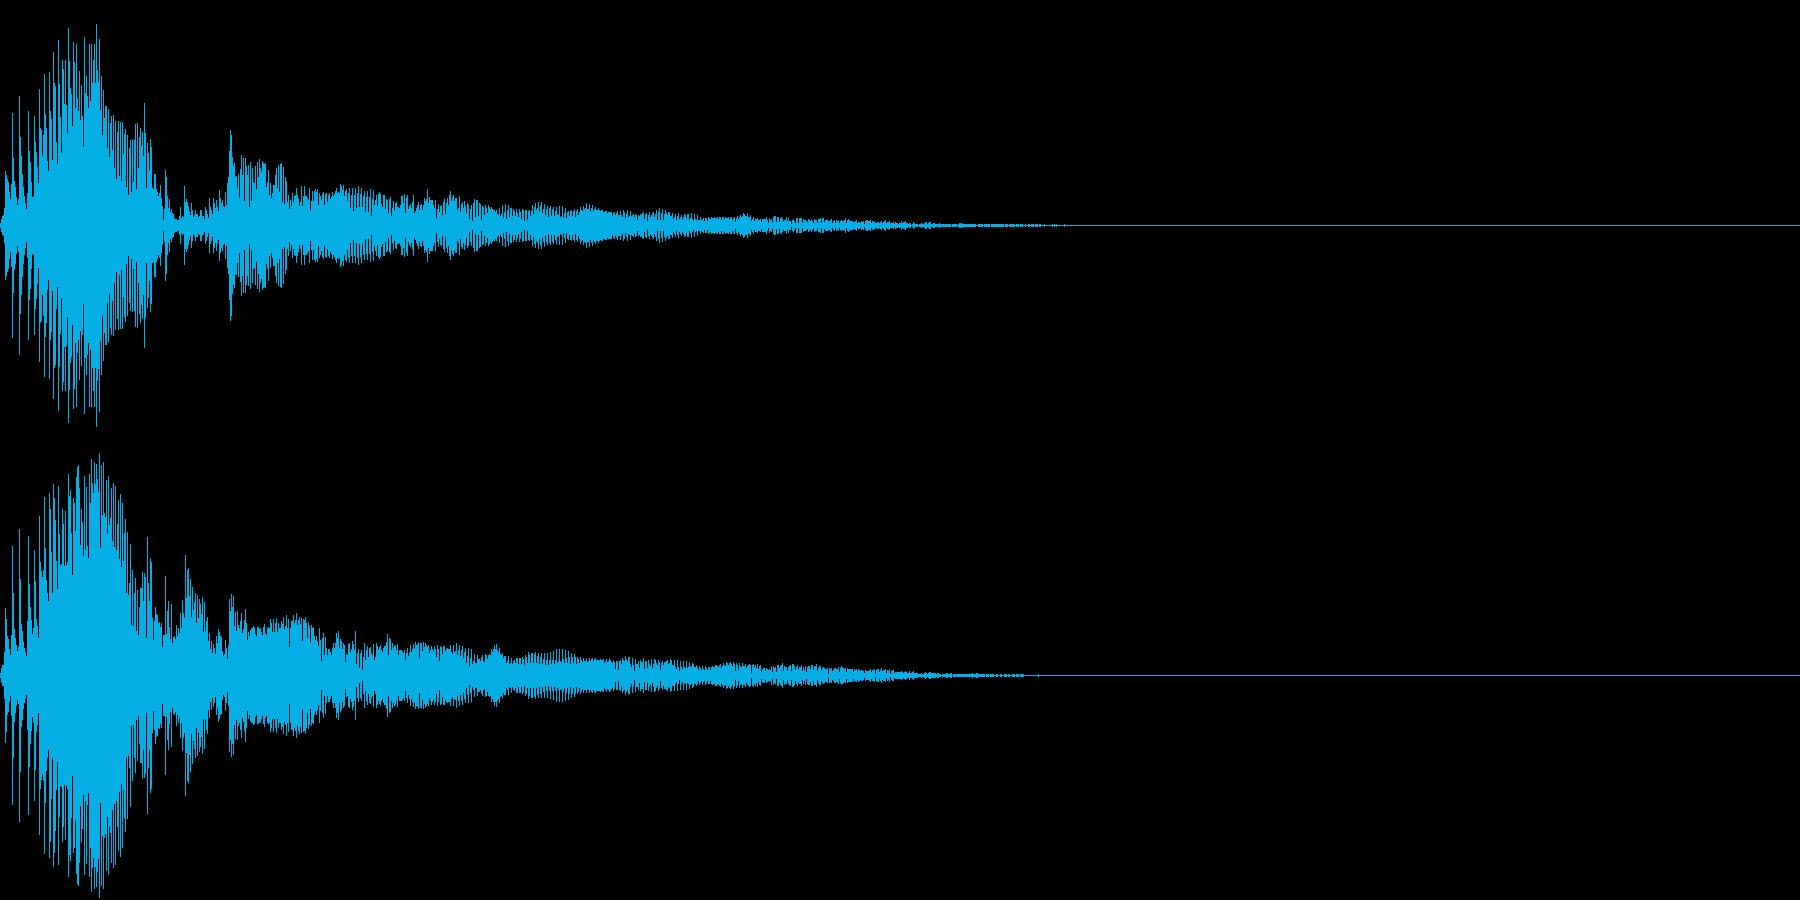 Zako ゲームのザコキャラの鳴き声 2の再生済みの波形